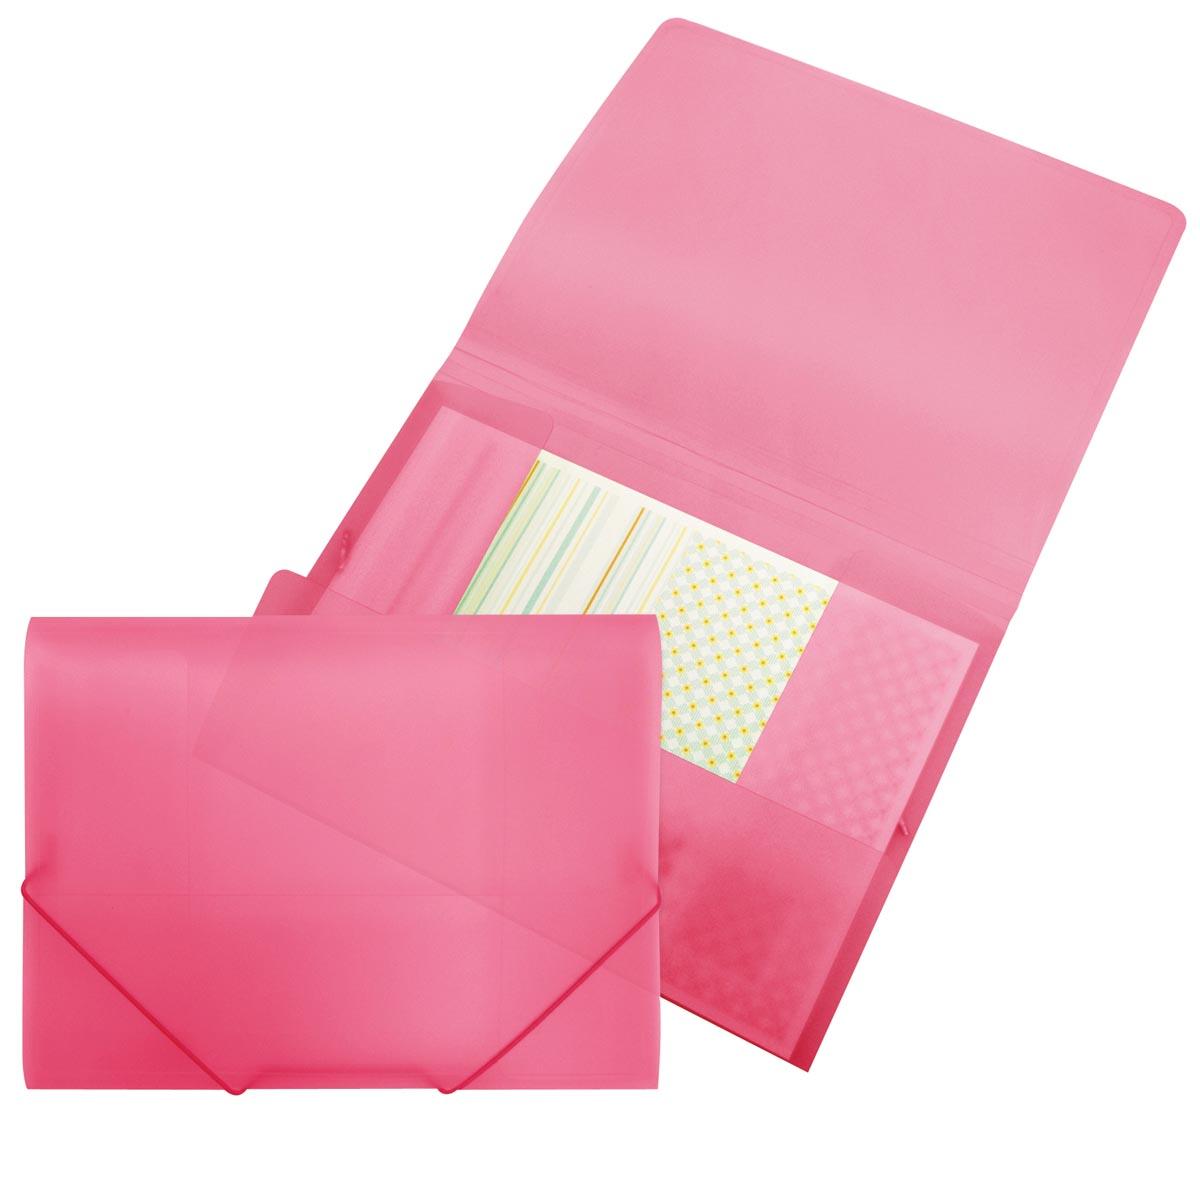 Beautone elastomap met kleppen, ft A4, roze